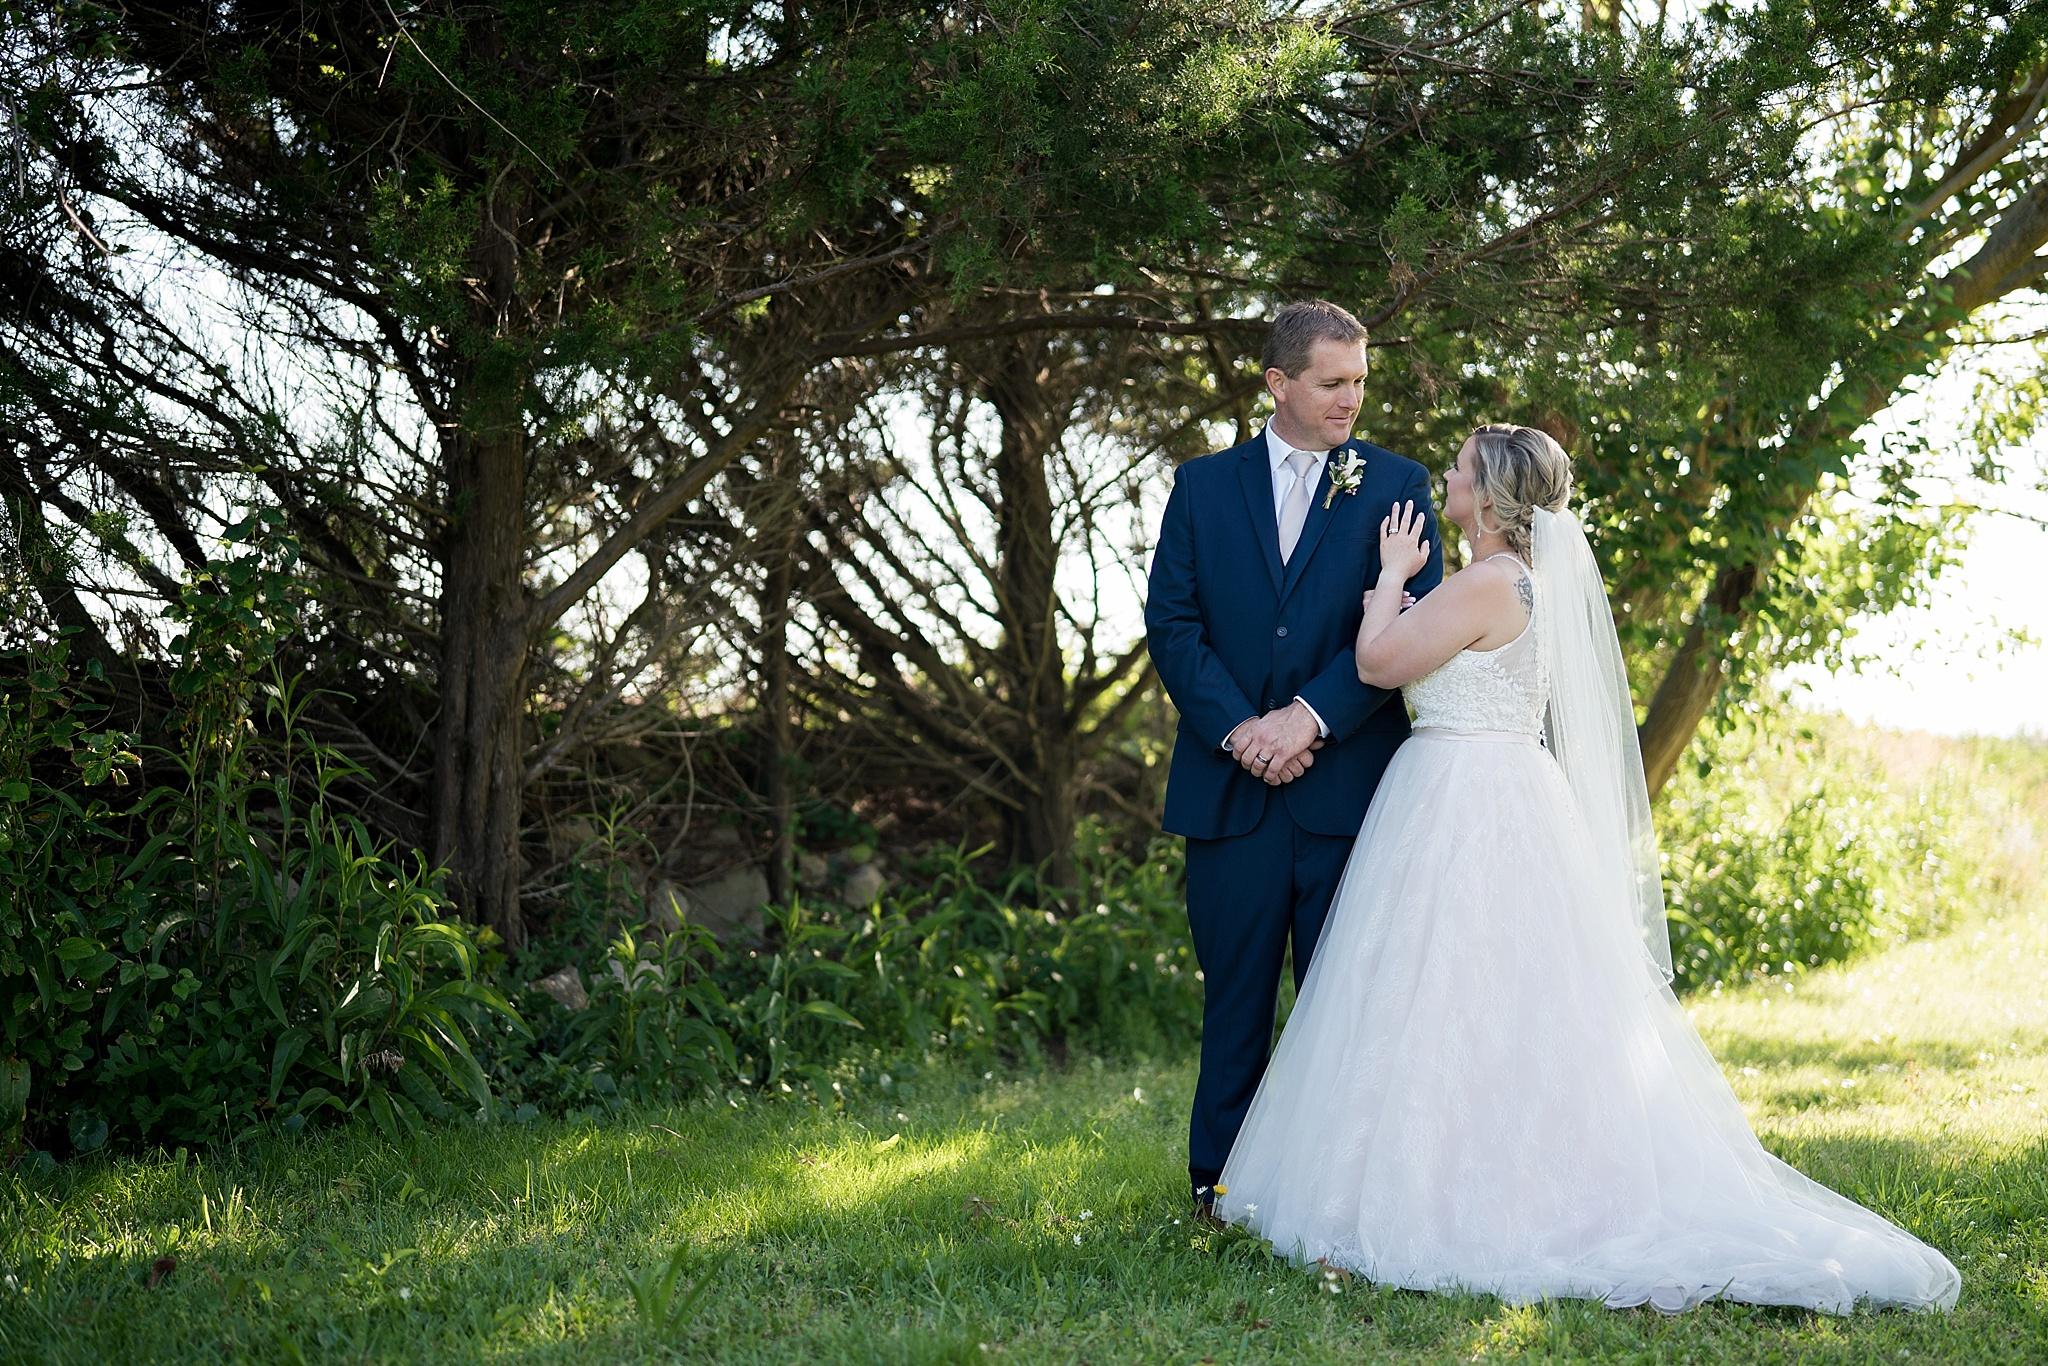 Crystal-Coast-Wedding-Photographer-035.jpg